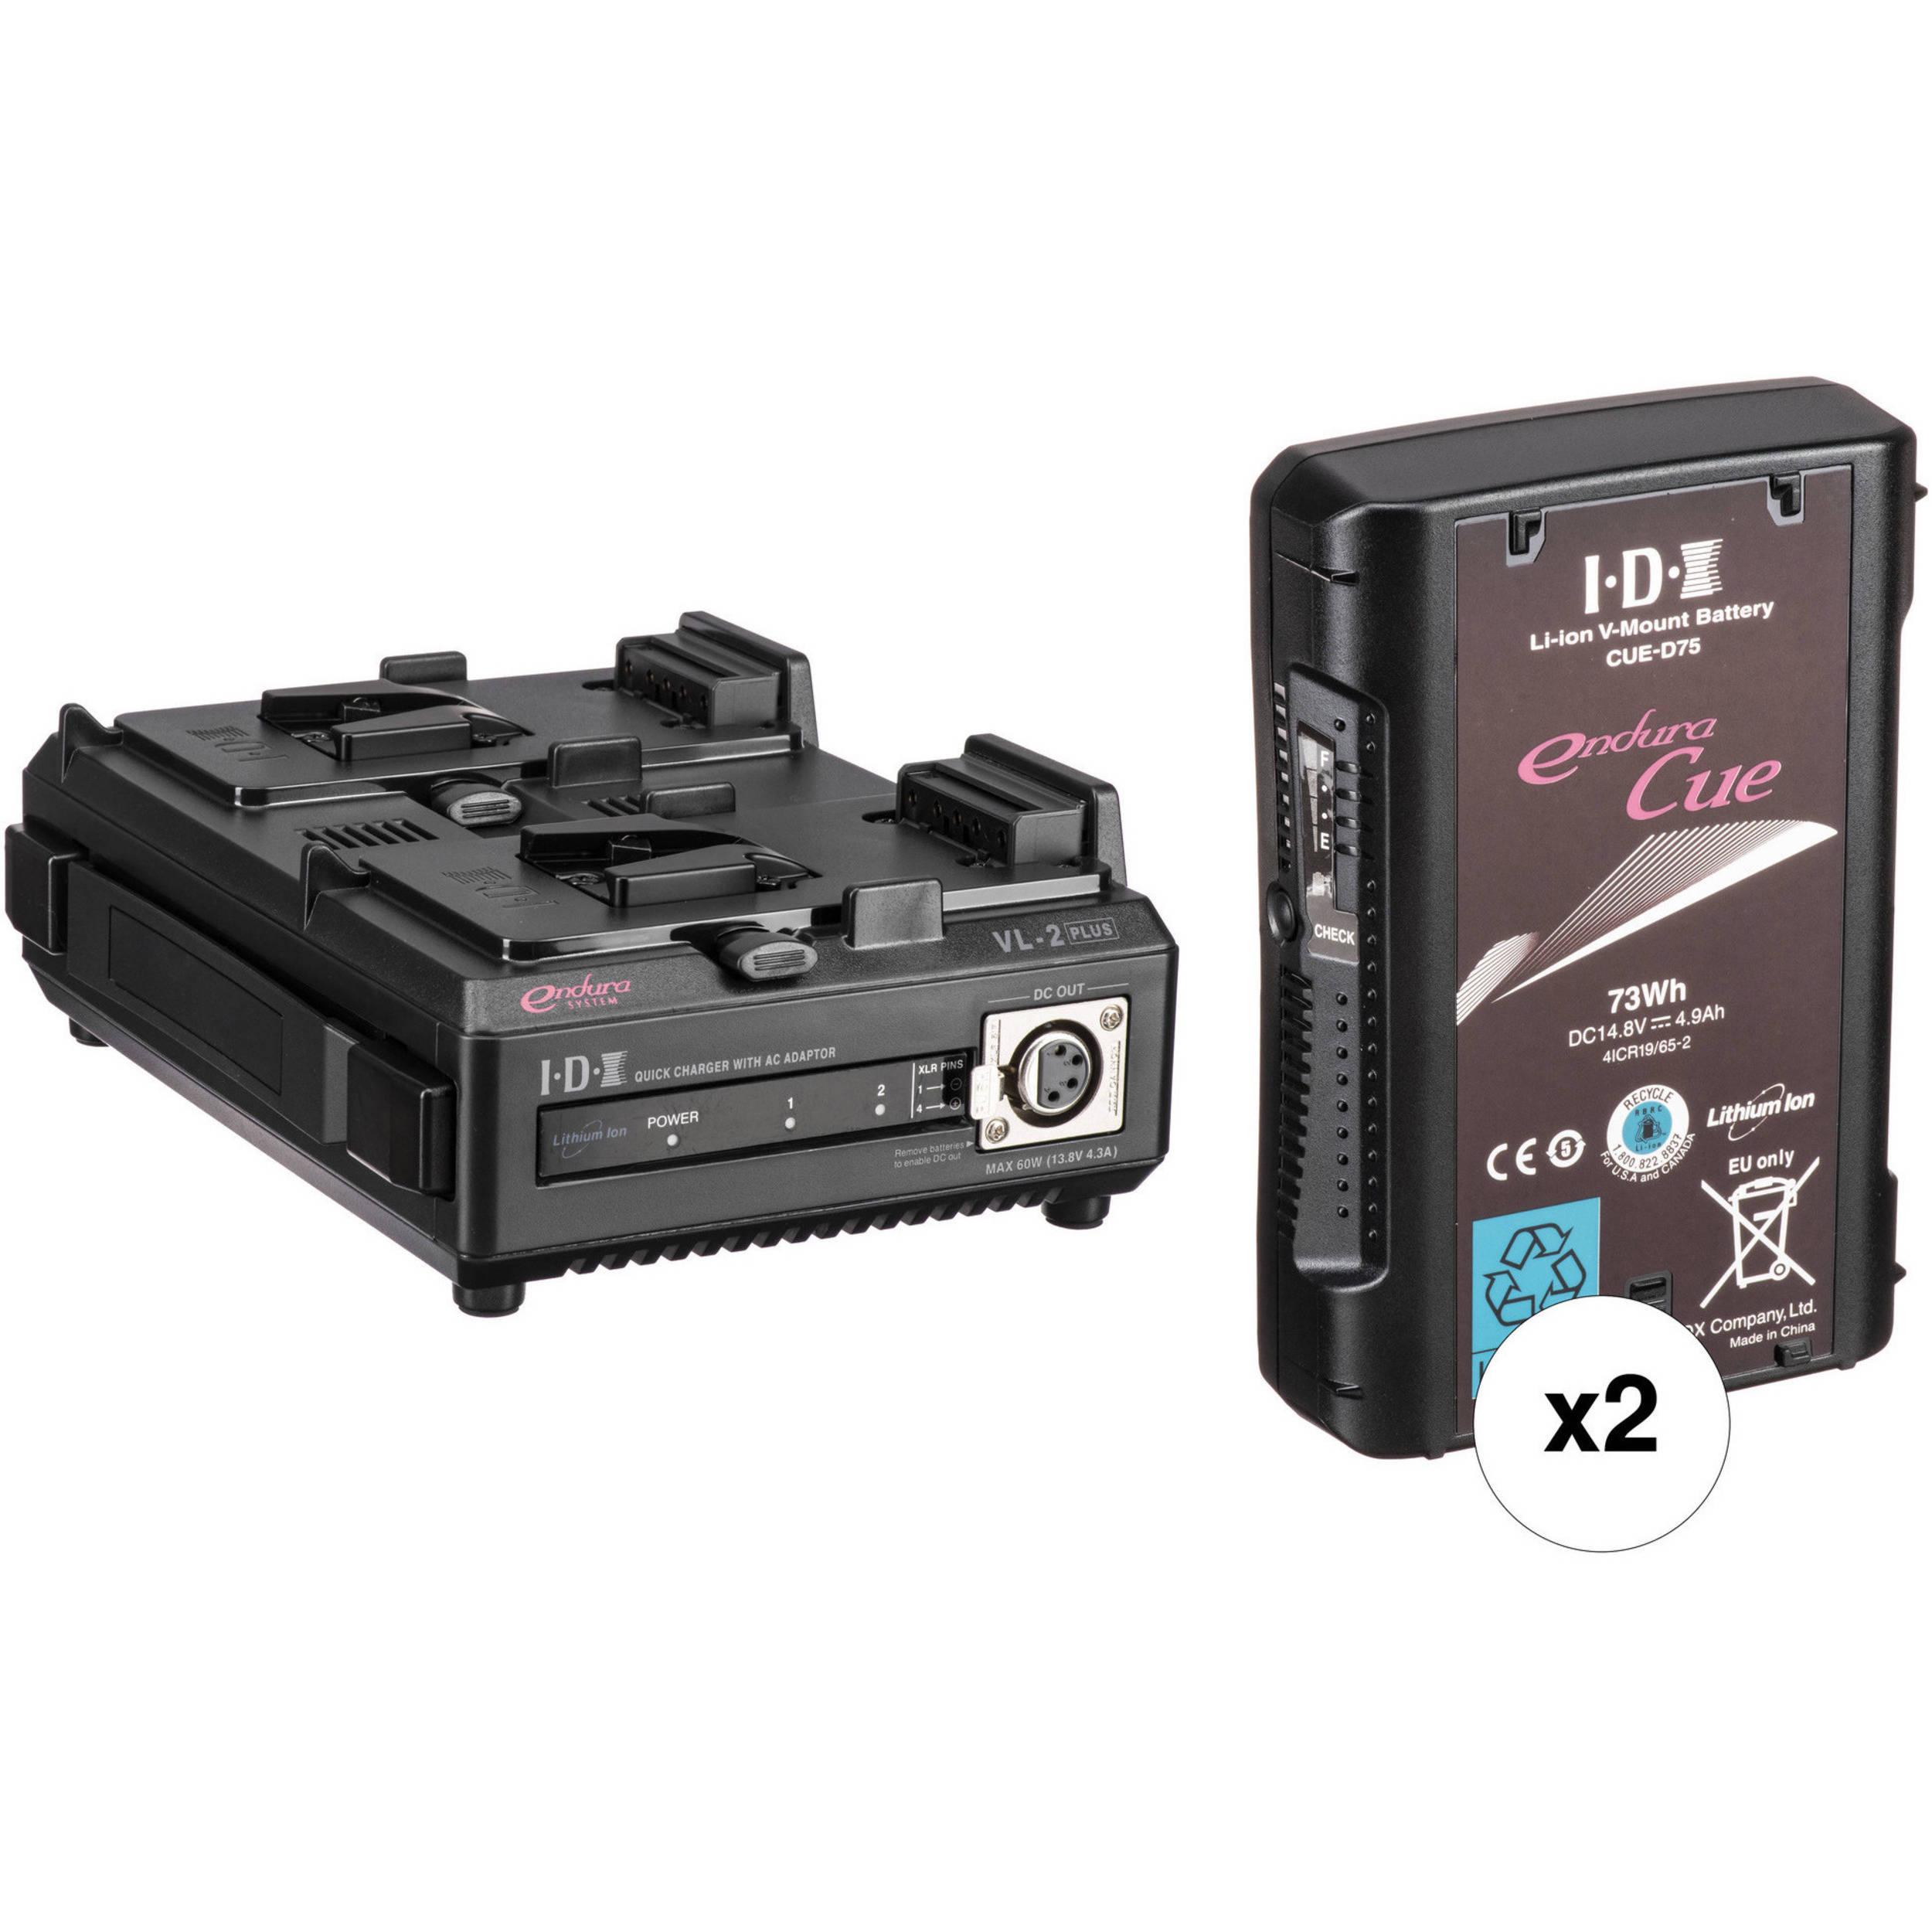 Https C Product 104744 Reg Fire 07 Jk Fuse Box Idx 73wh Li Ion V Mount Batt 1123369